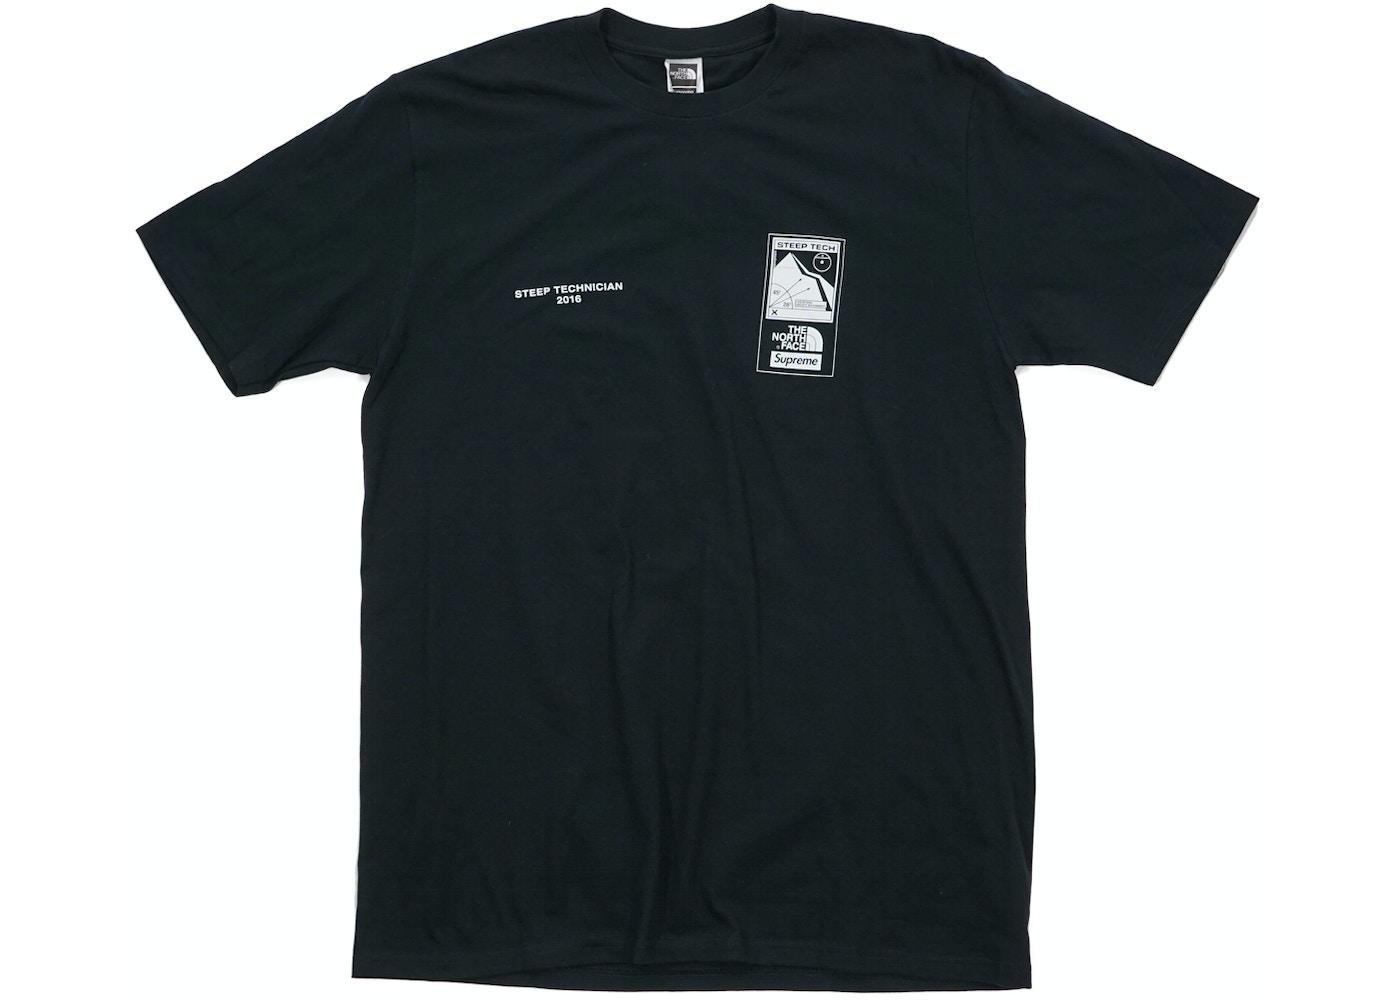 Supreme The North Face Steep Tech T Shirt Black - SS16 9c536992b98b